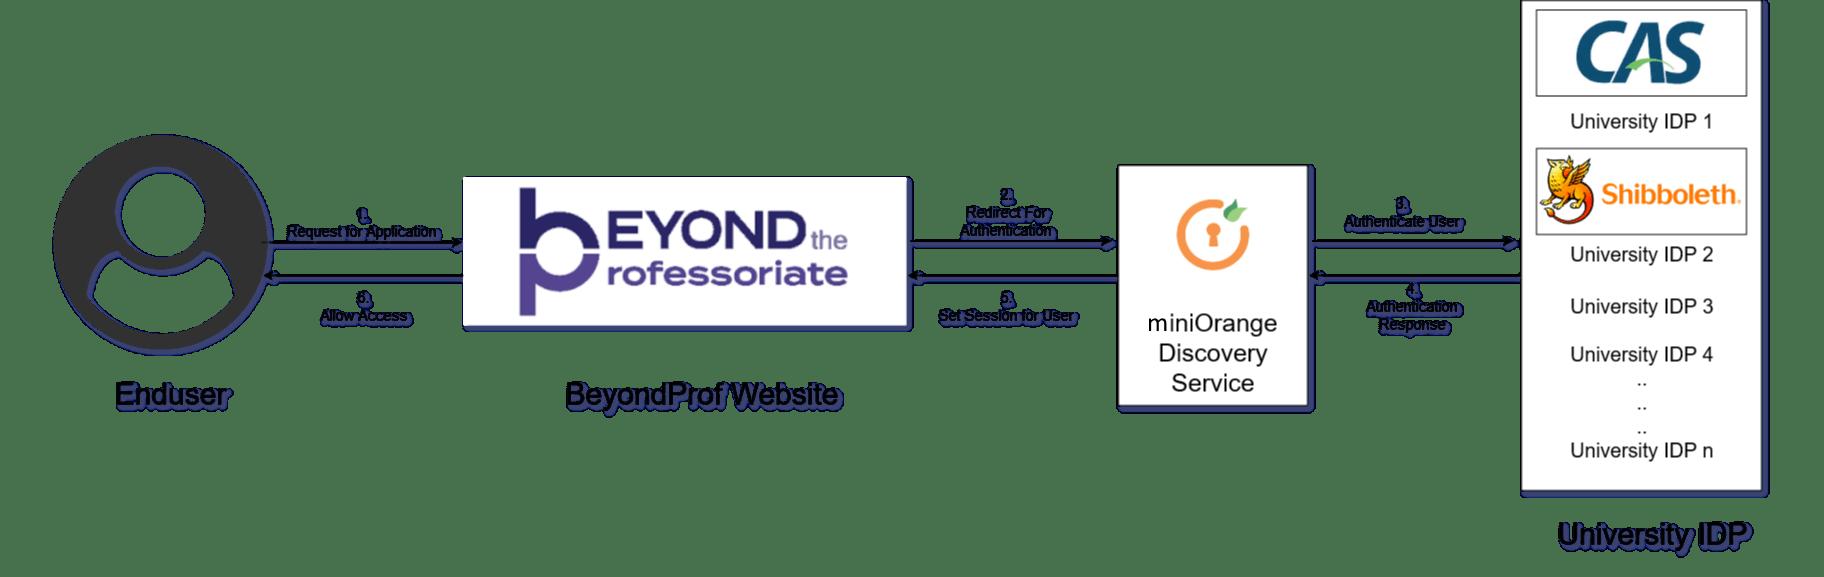 BeyondProf Authentication Flow